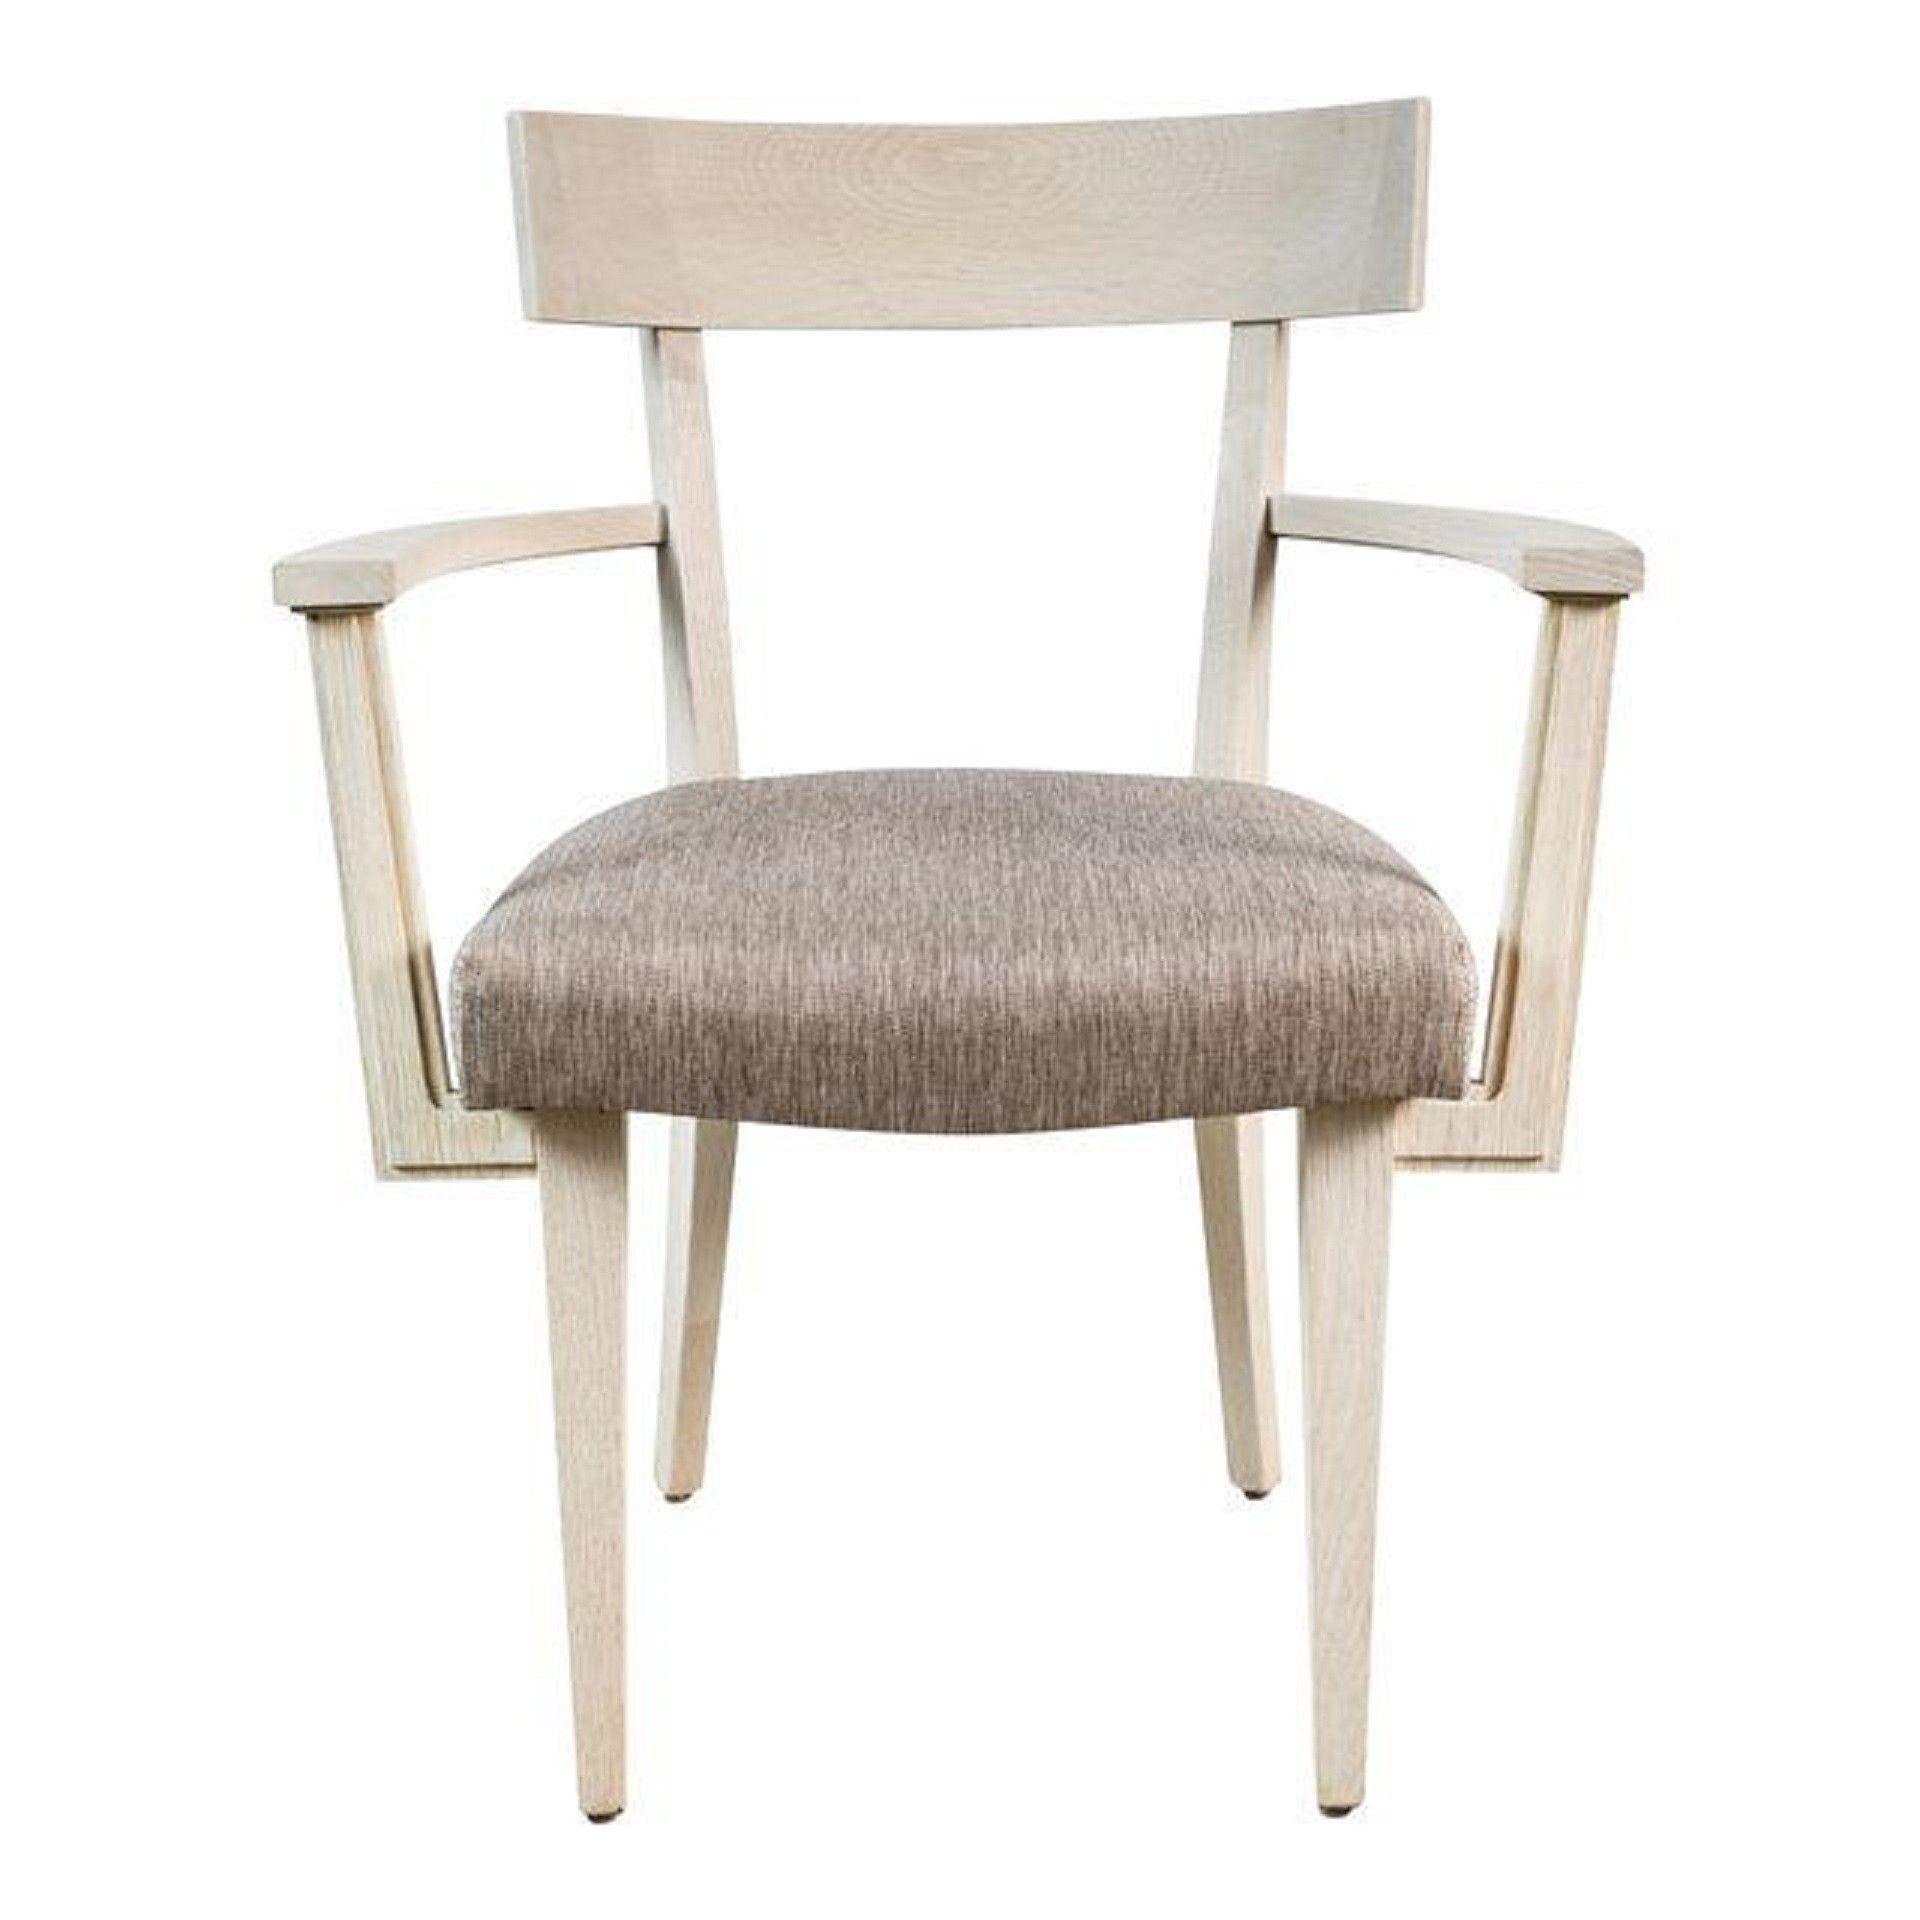 Modern+Klismos+Chair+-+Modern+Klismos+dining+chair+or+desk+chair